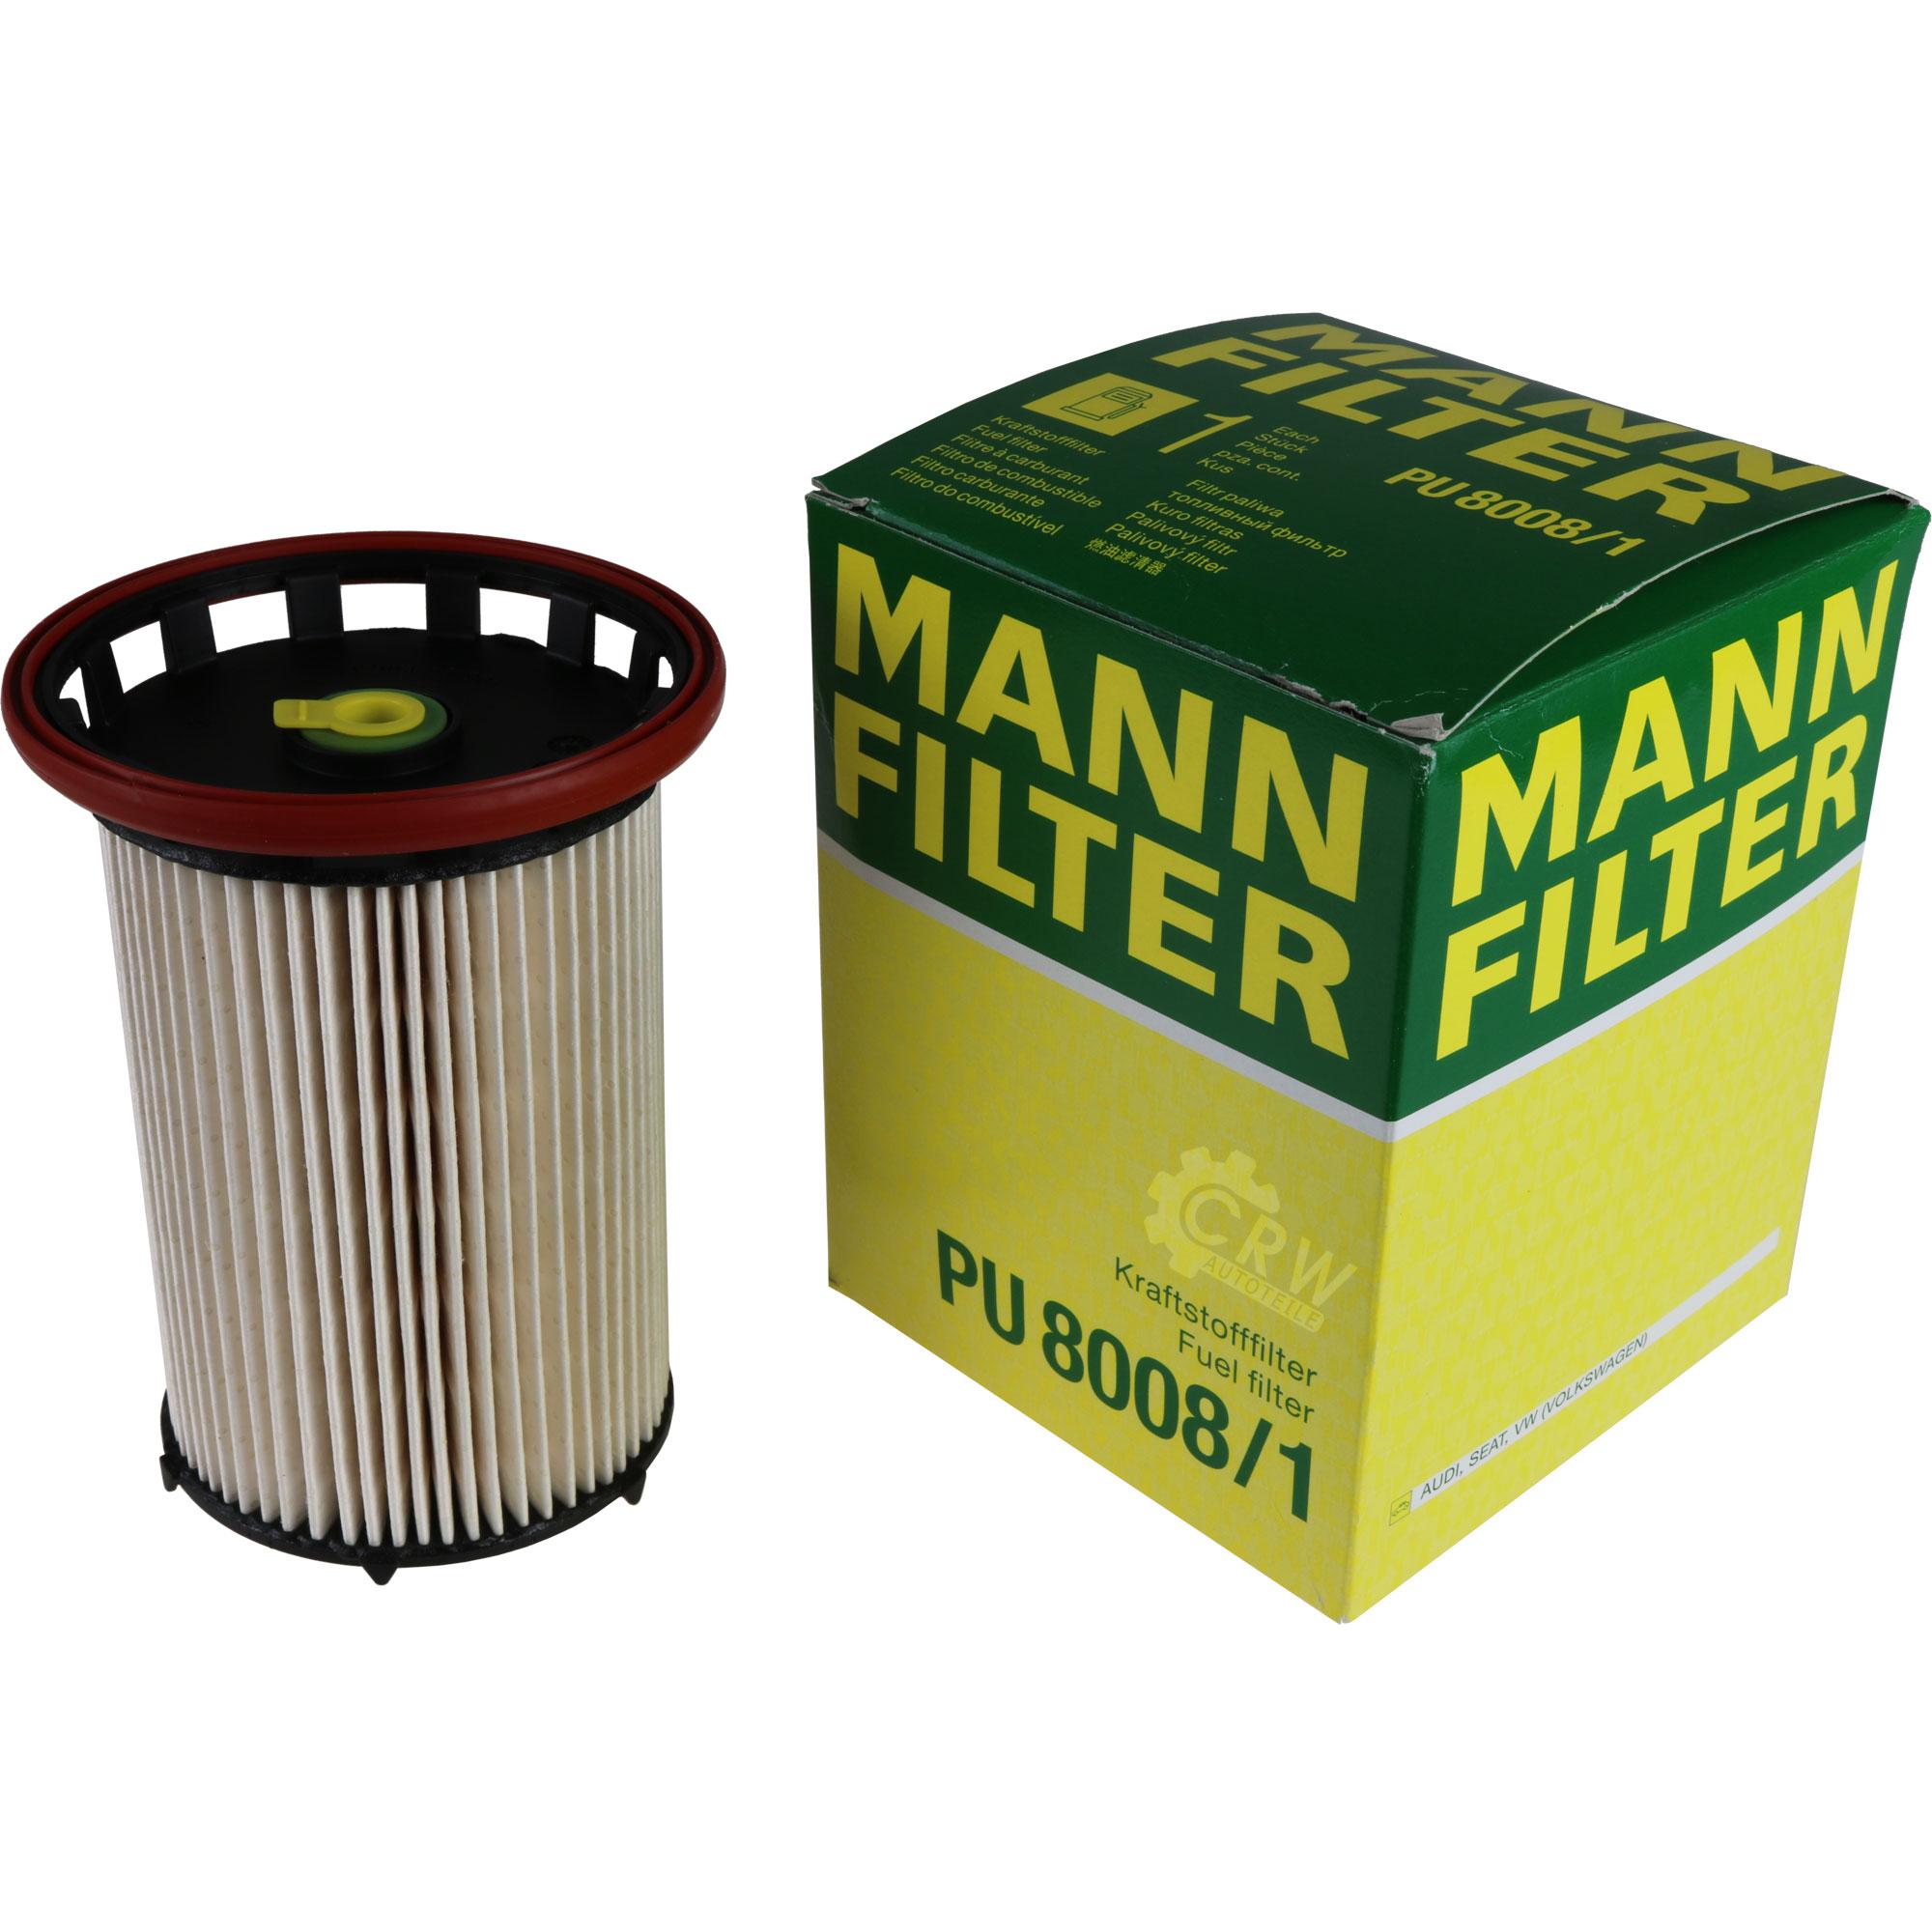 Vw passat 3C5 2.0 tdi 16V 4 motion genuine borg /& beck filtre carburant